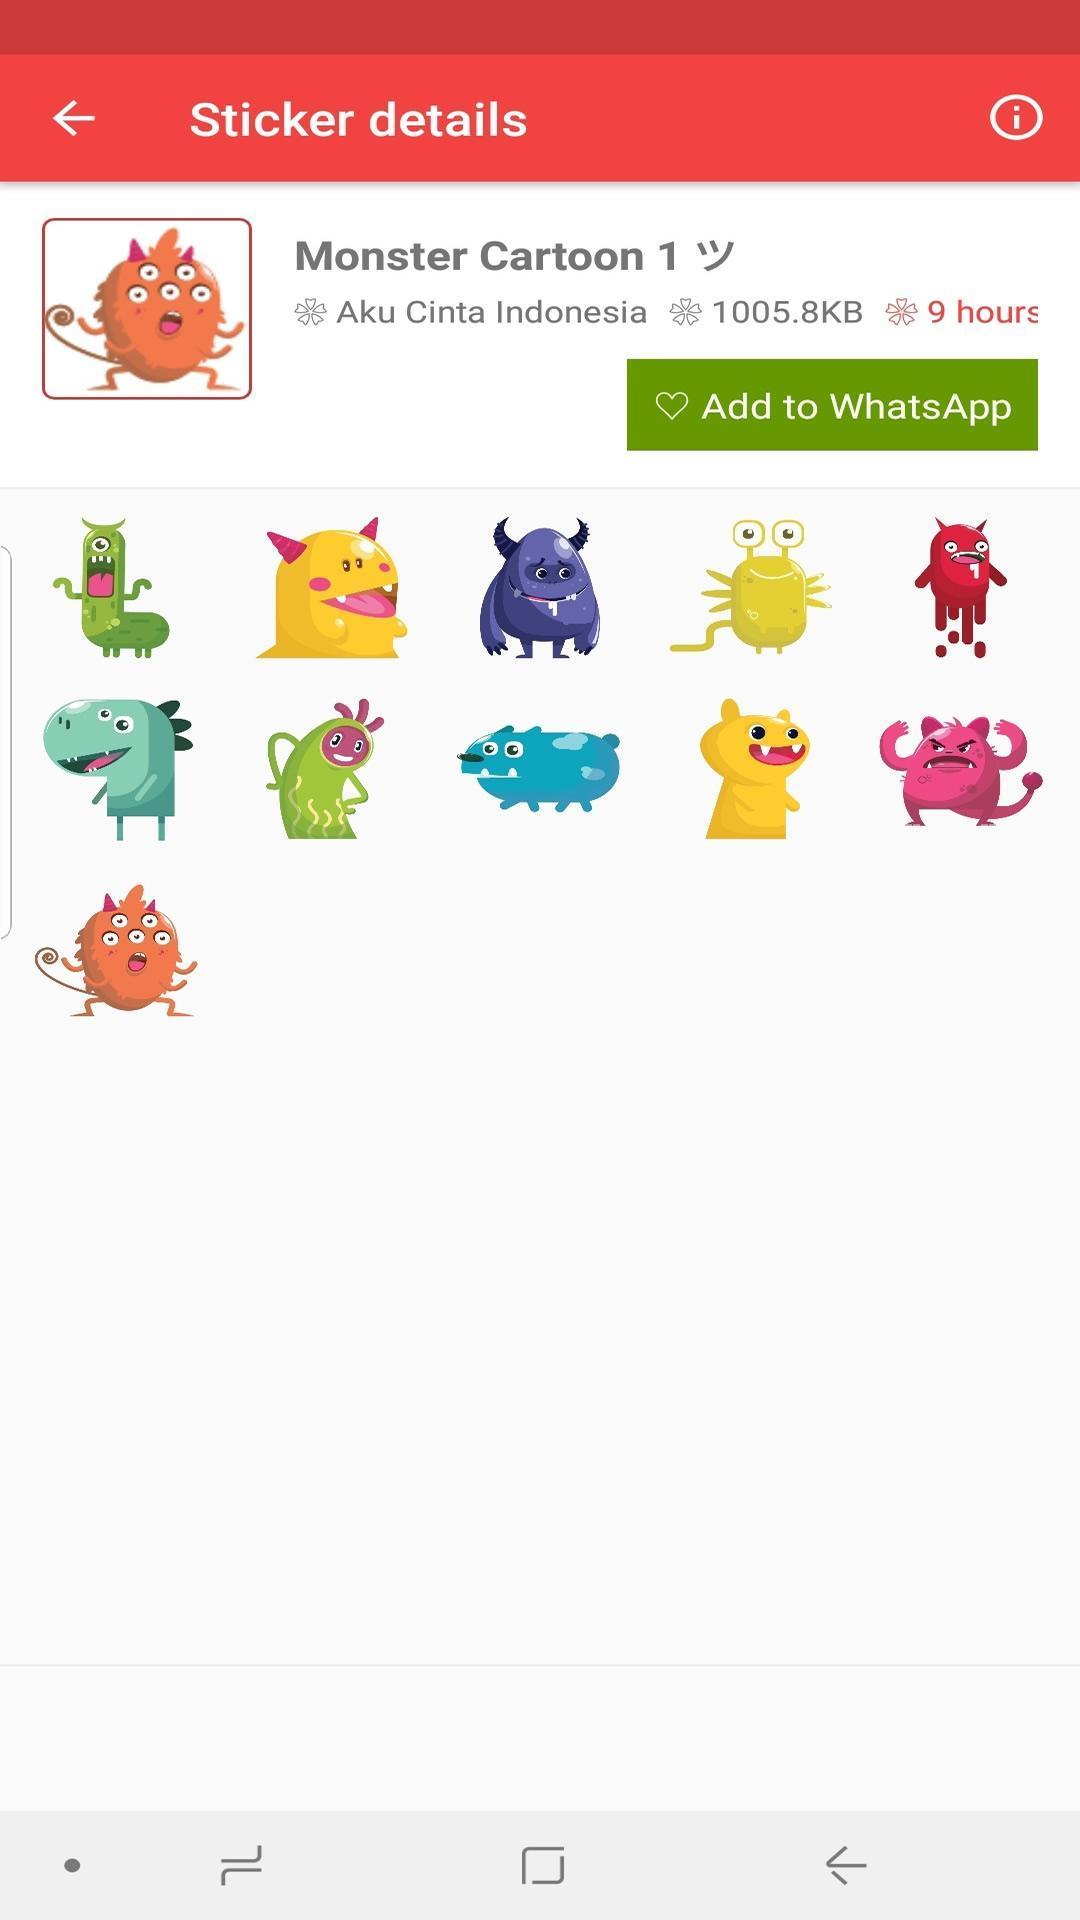 470 Gambar Kartun Lucu Untuk Whatsapp Hd Terbaru Gambar Kantun